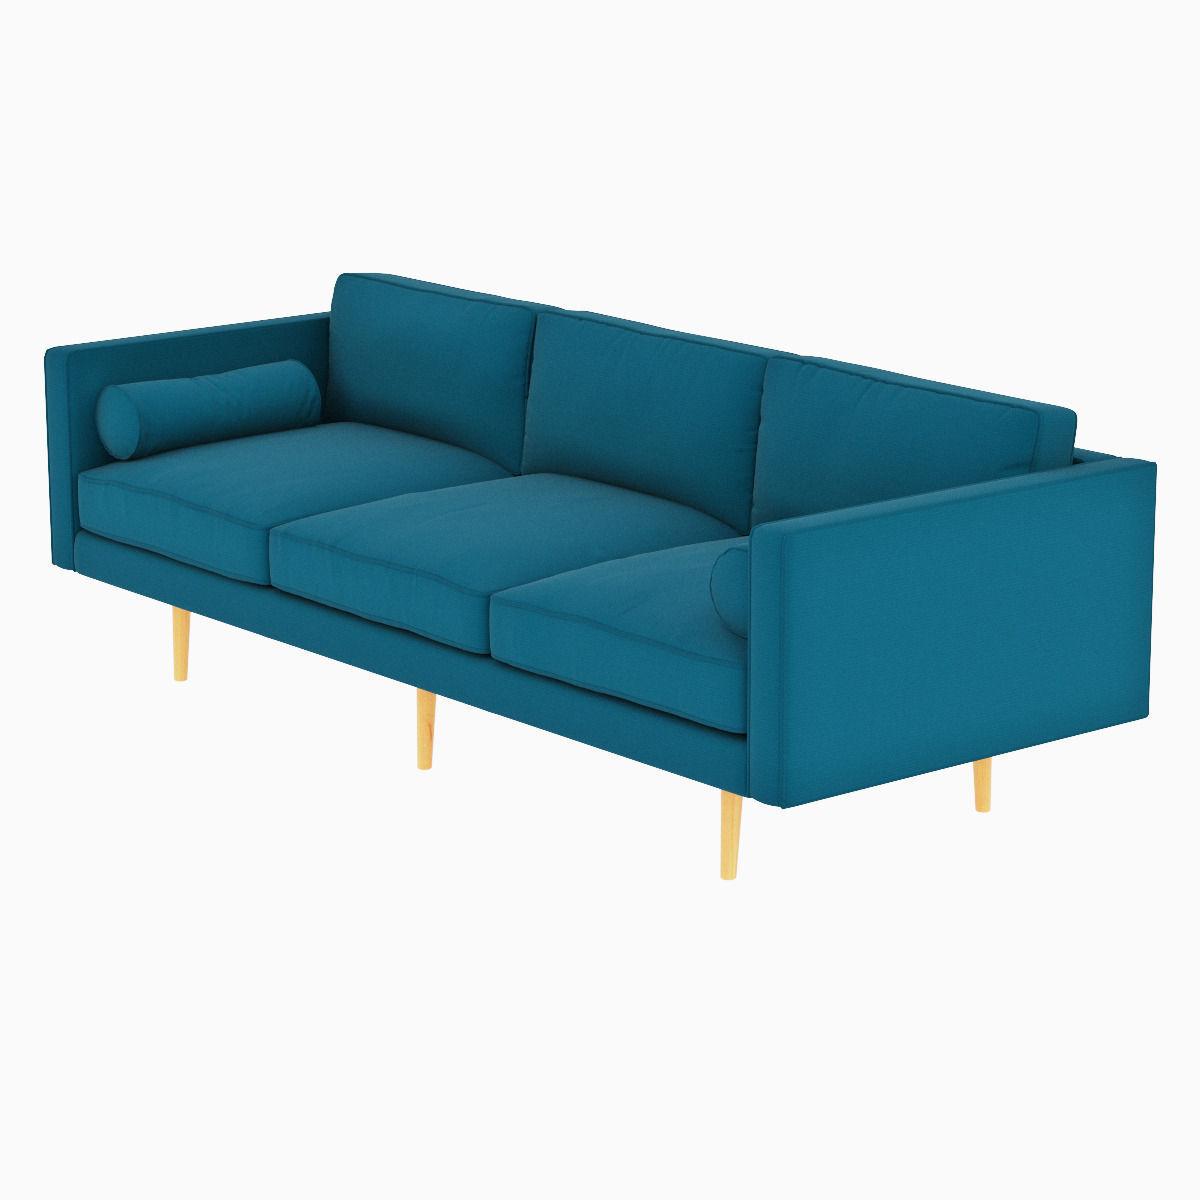 ... West Elm Monroe Mid Century Sofa 3d Model Max Obj Fbx Mtl 3 ...